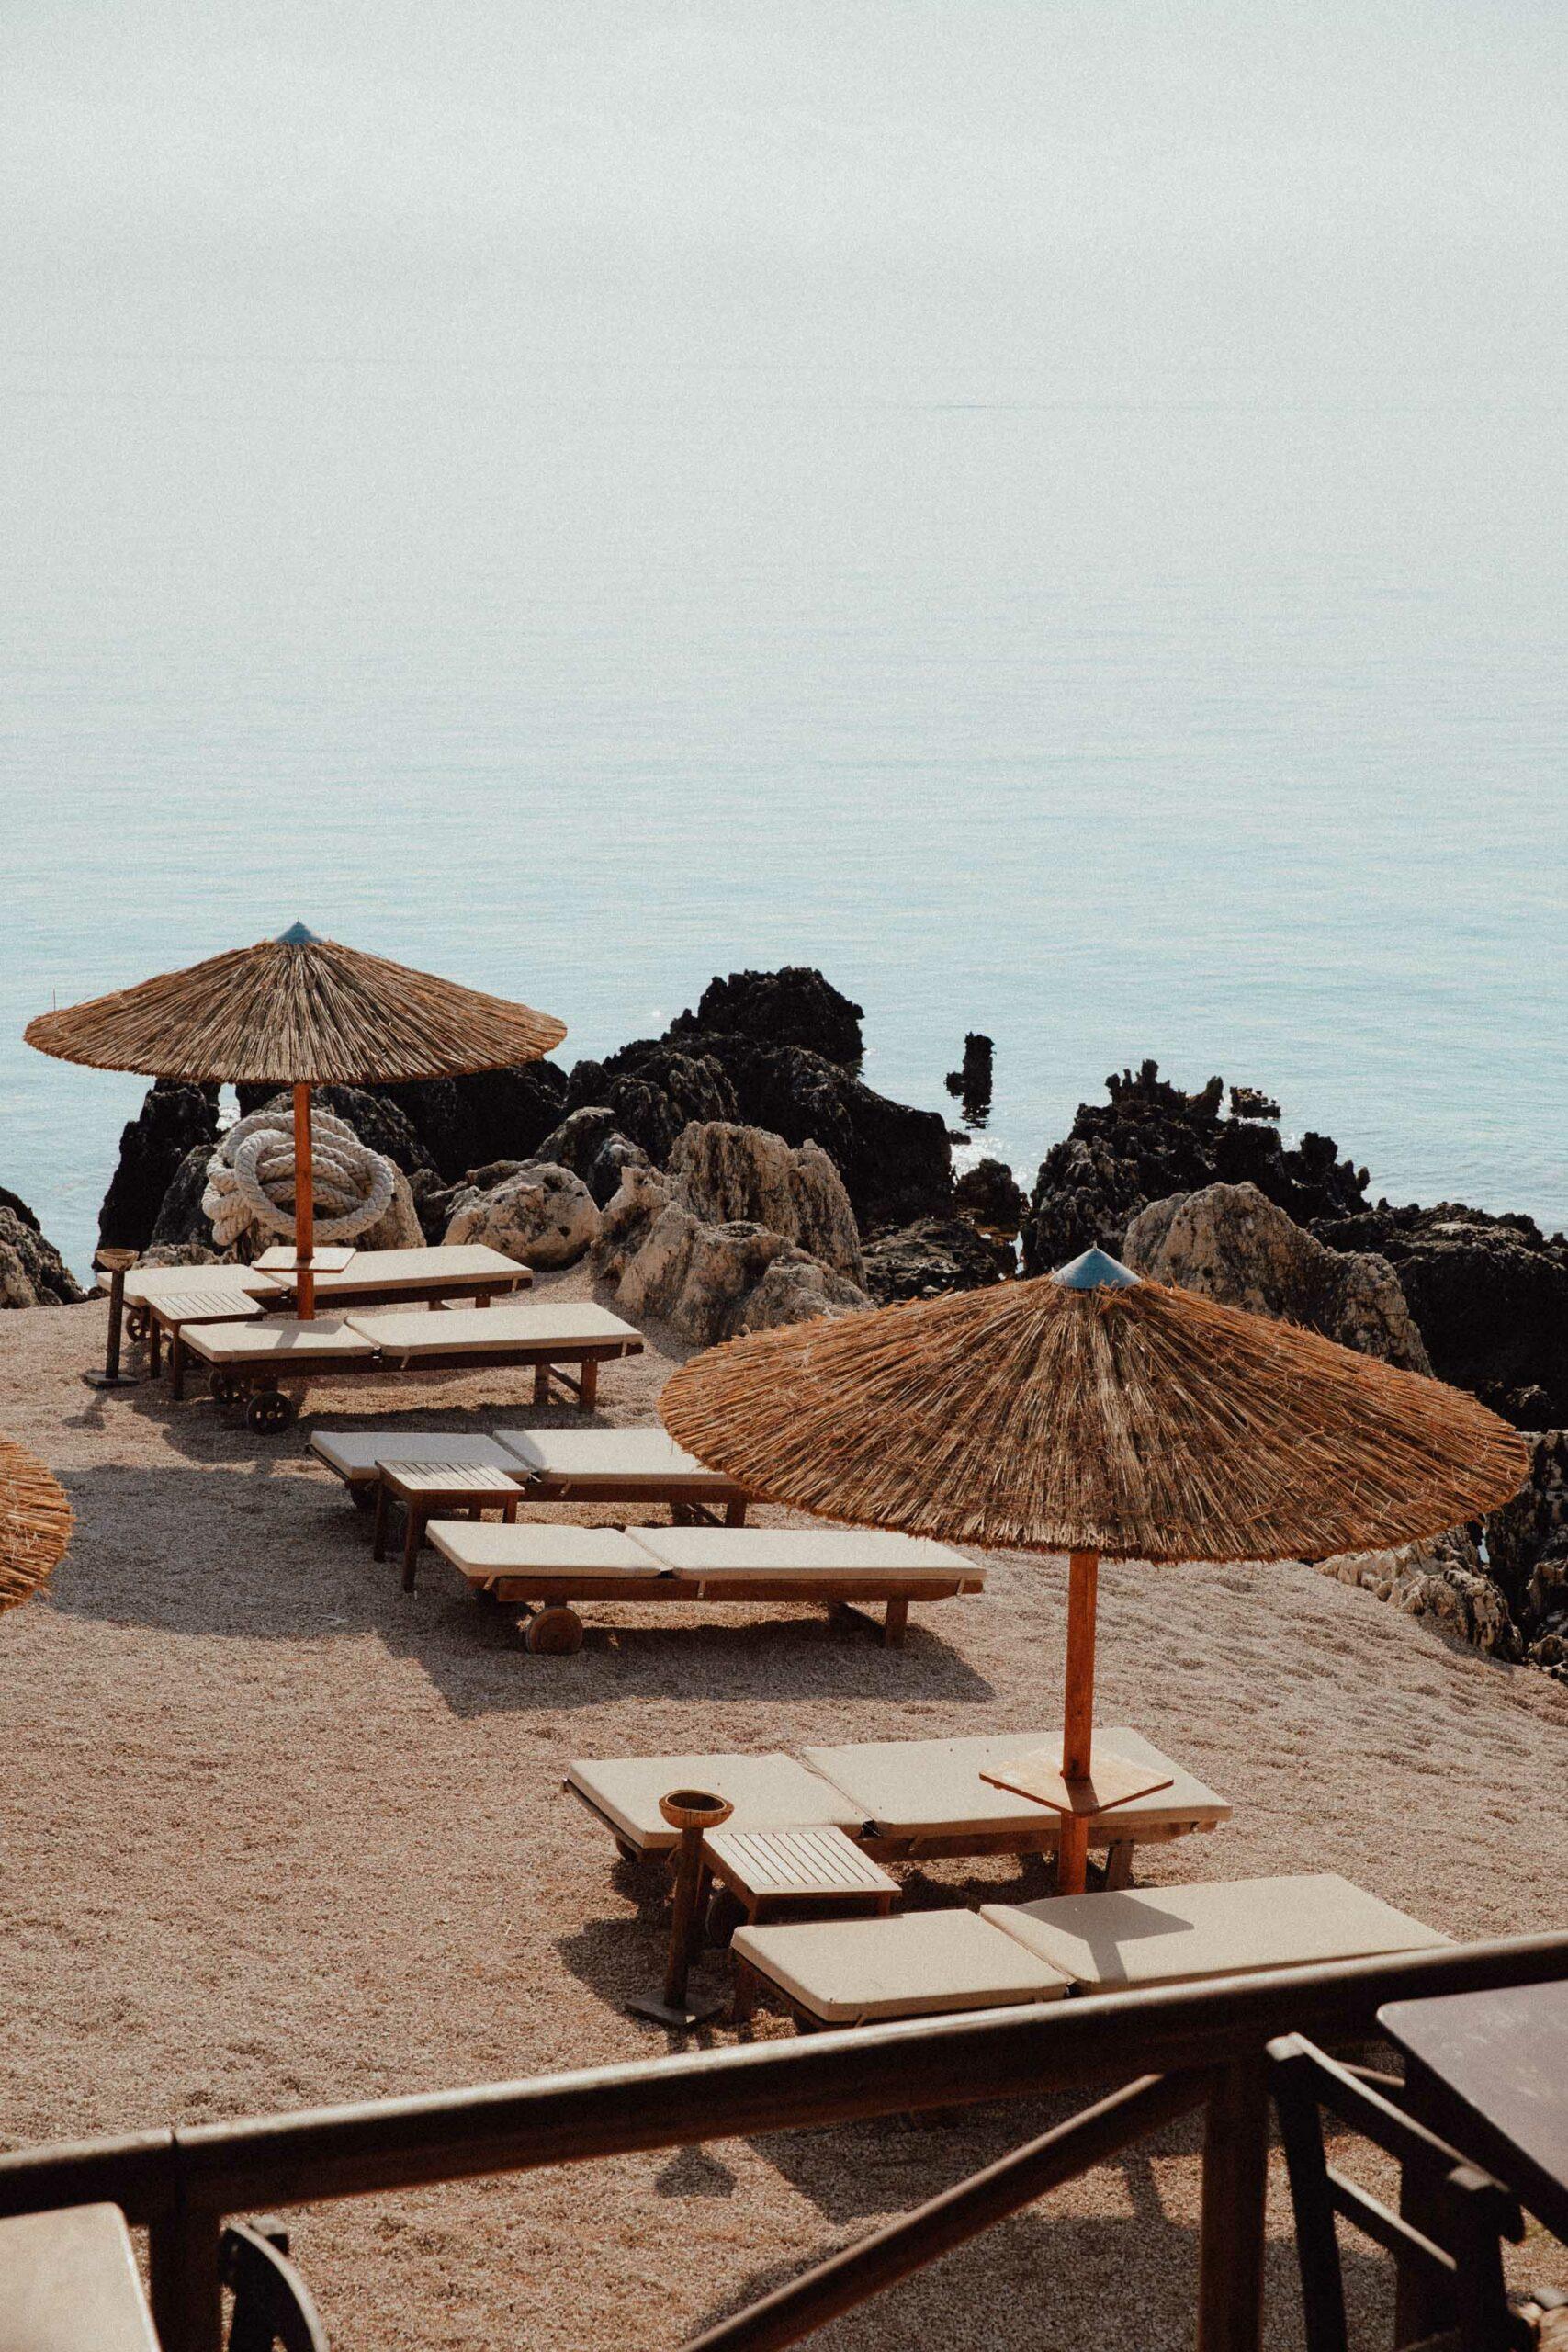 Nobelos seaside restaurant beach in Agios Nikolaos Zakynthos Greece